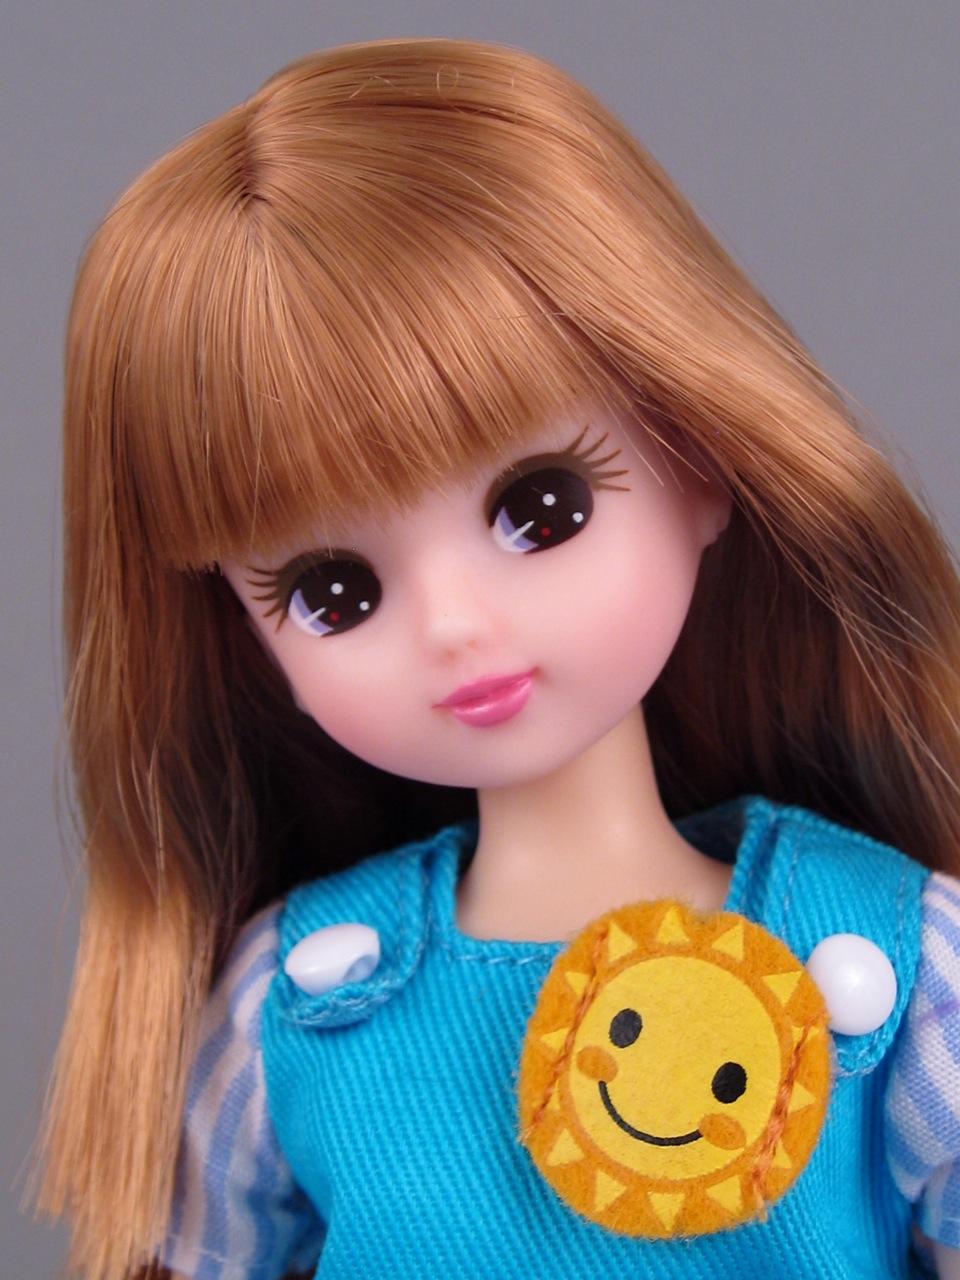 Licca-chan doll